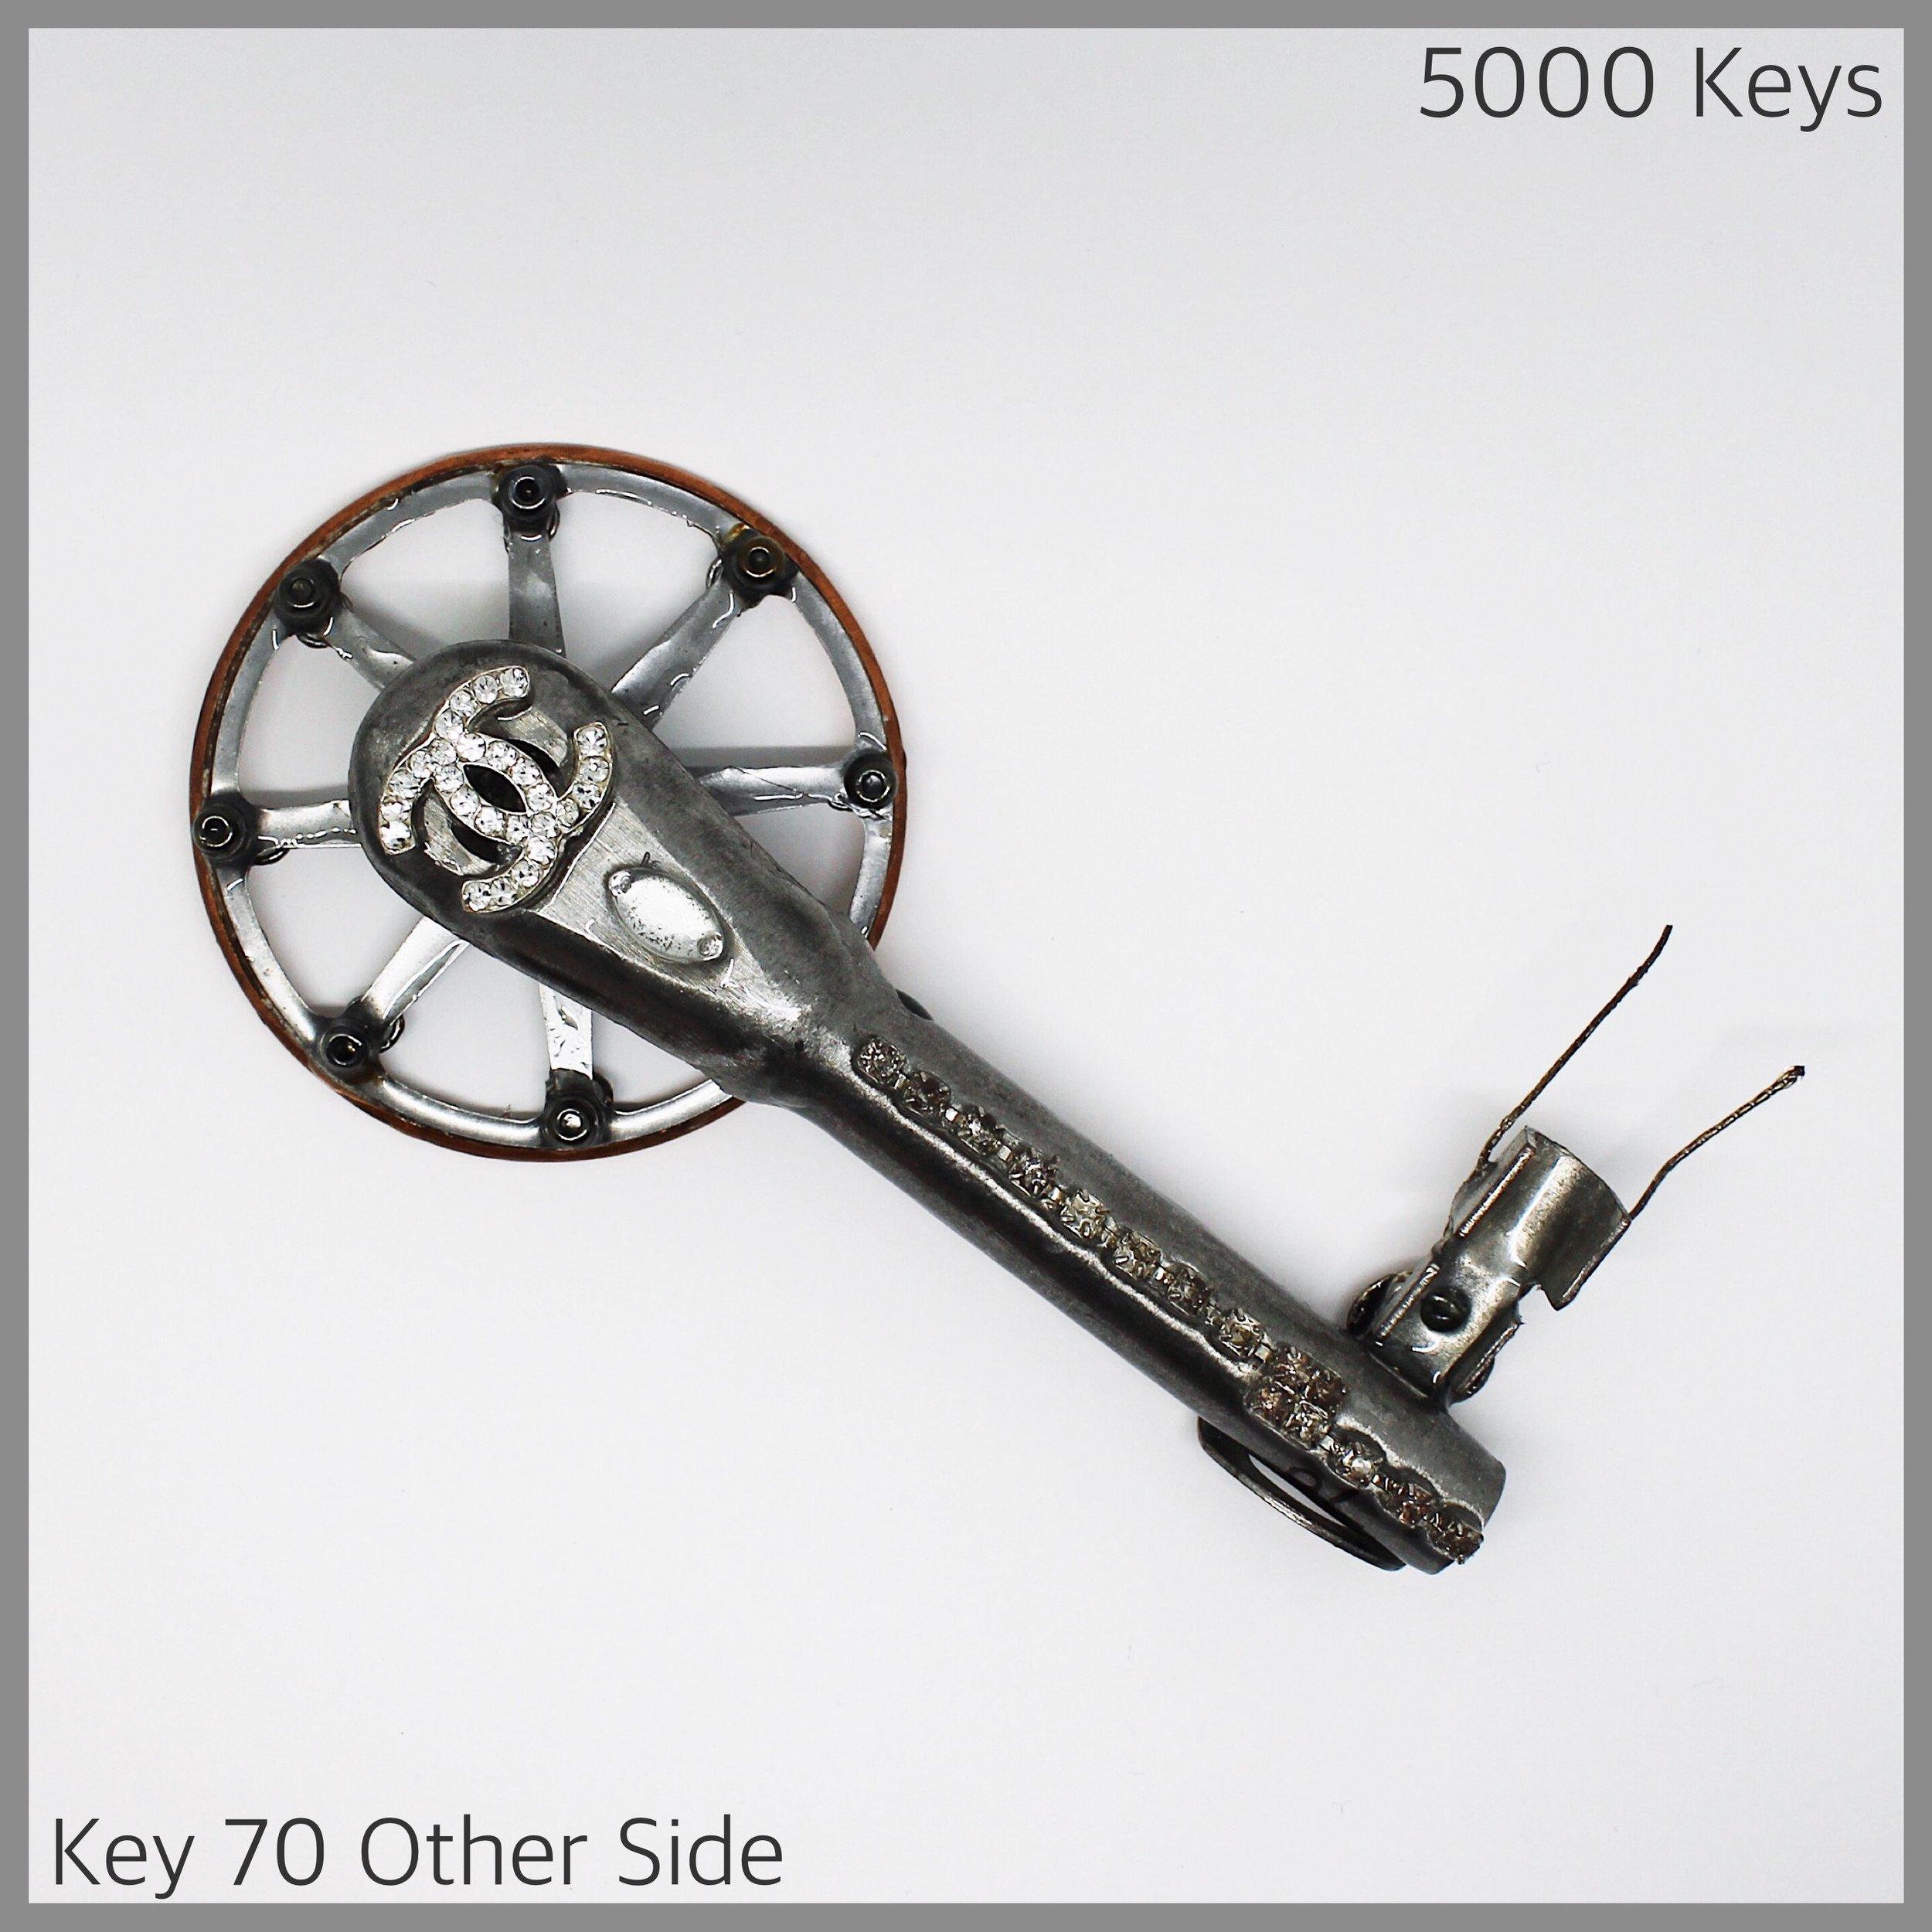 Key 70 other side - 1.JPG